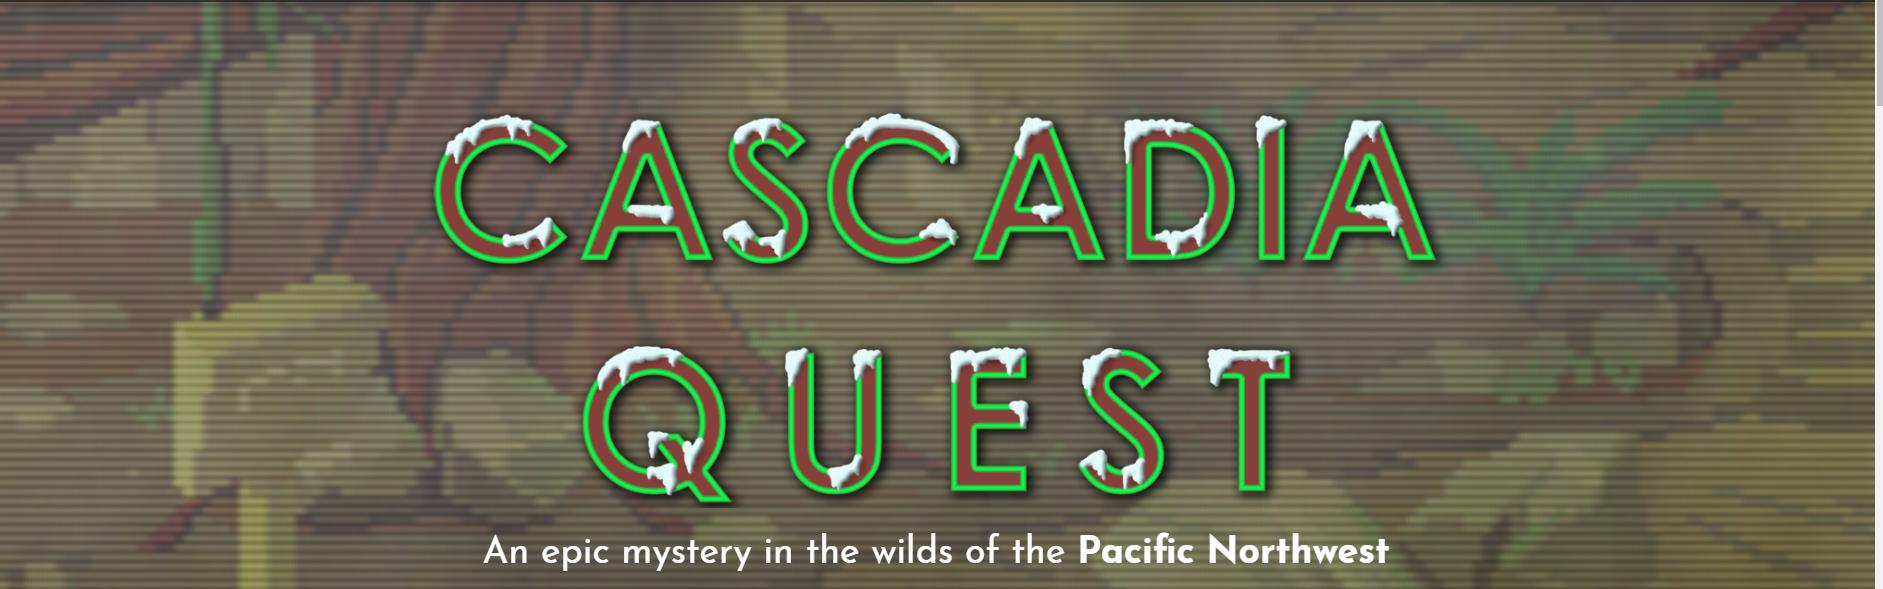 Cascadia Quest.PNG